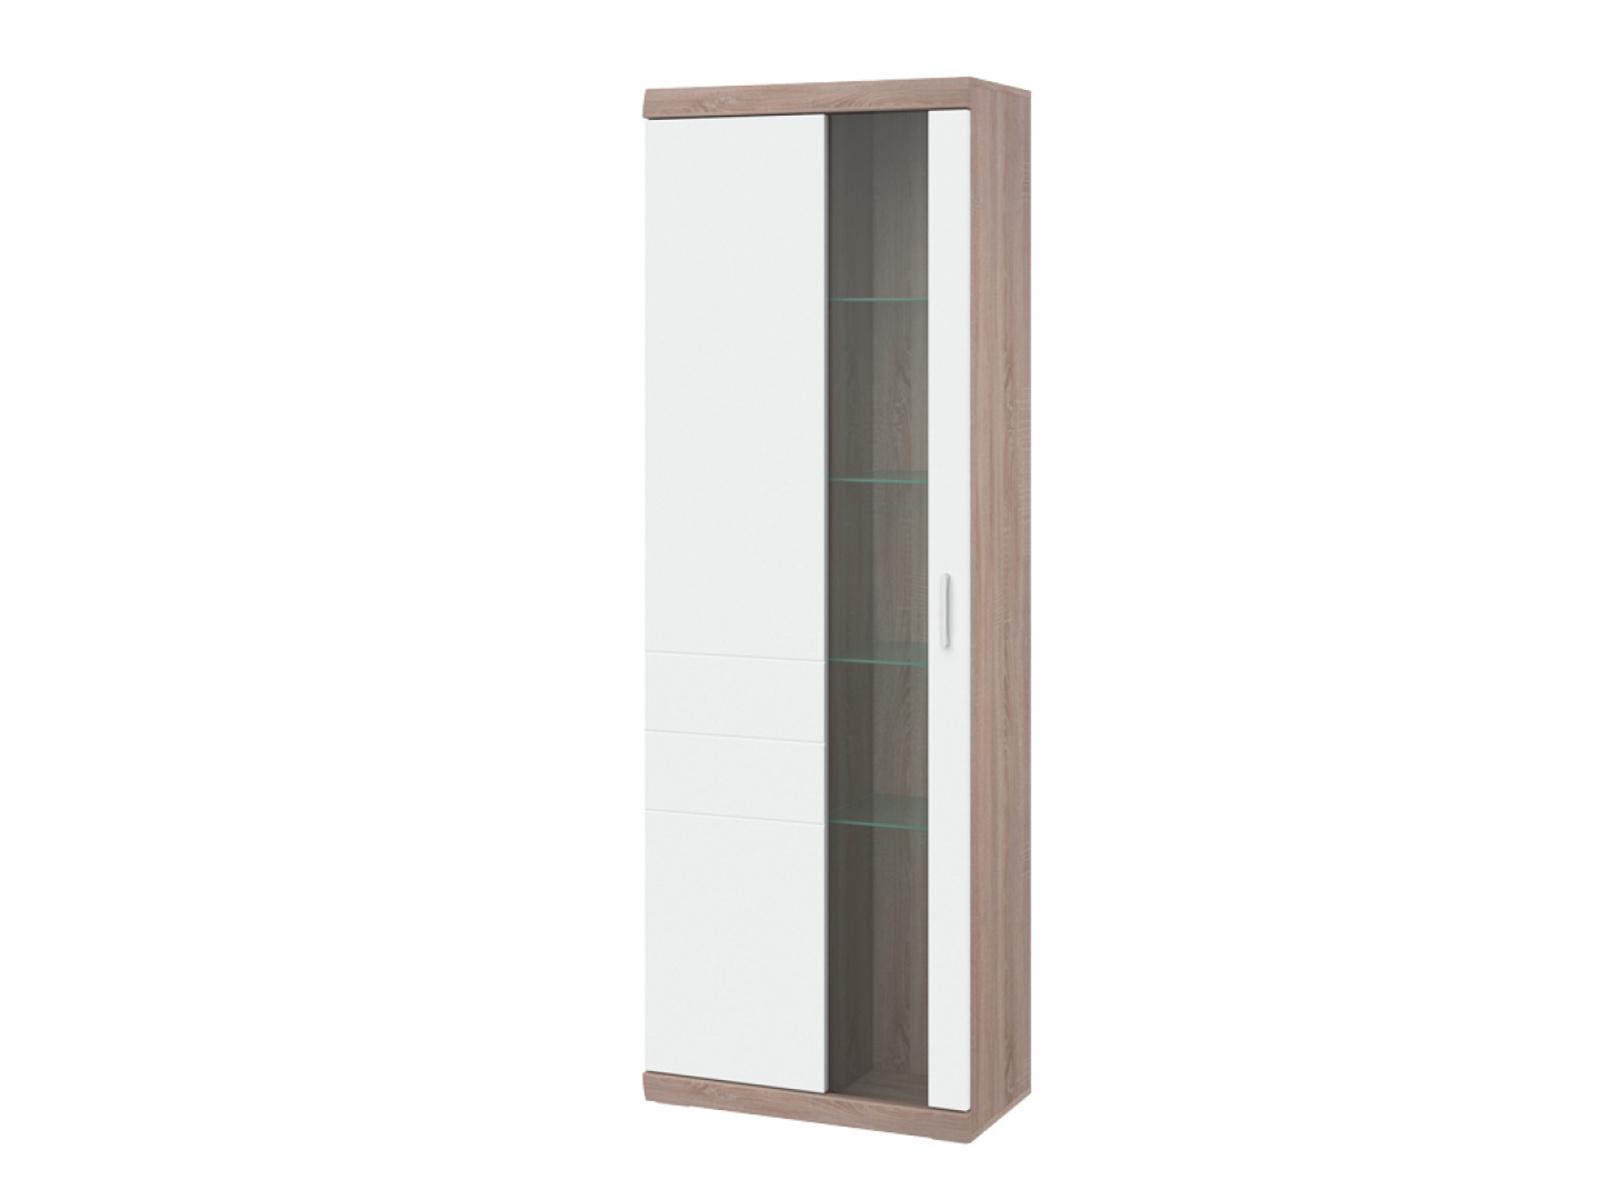 Decodom TOGGO typ 01 vitrína levá, dub bardolino/bílá